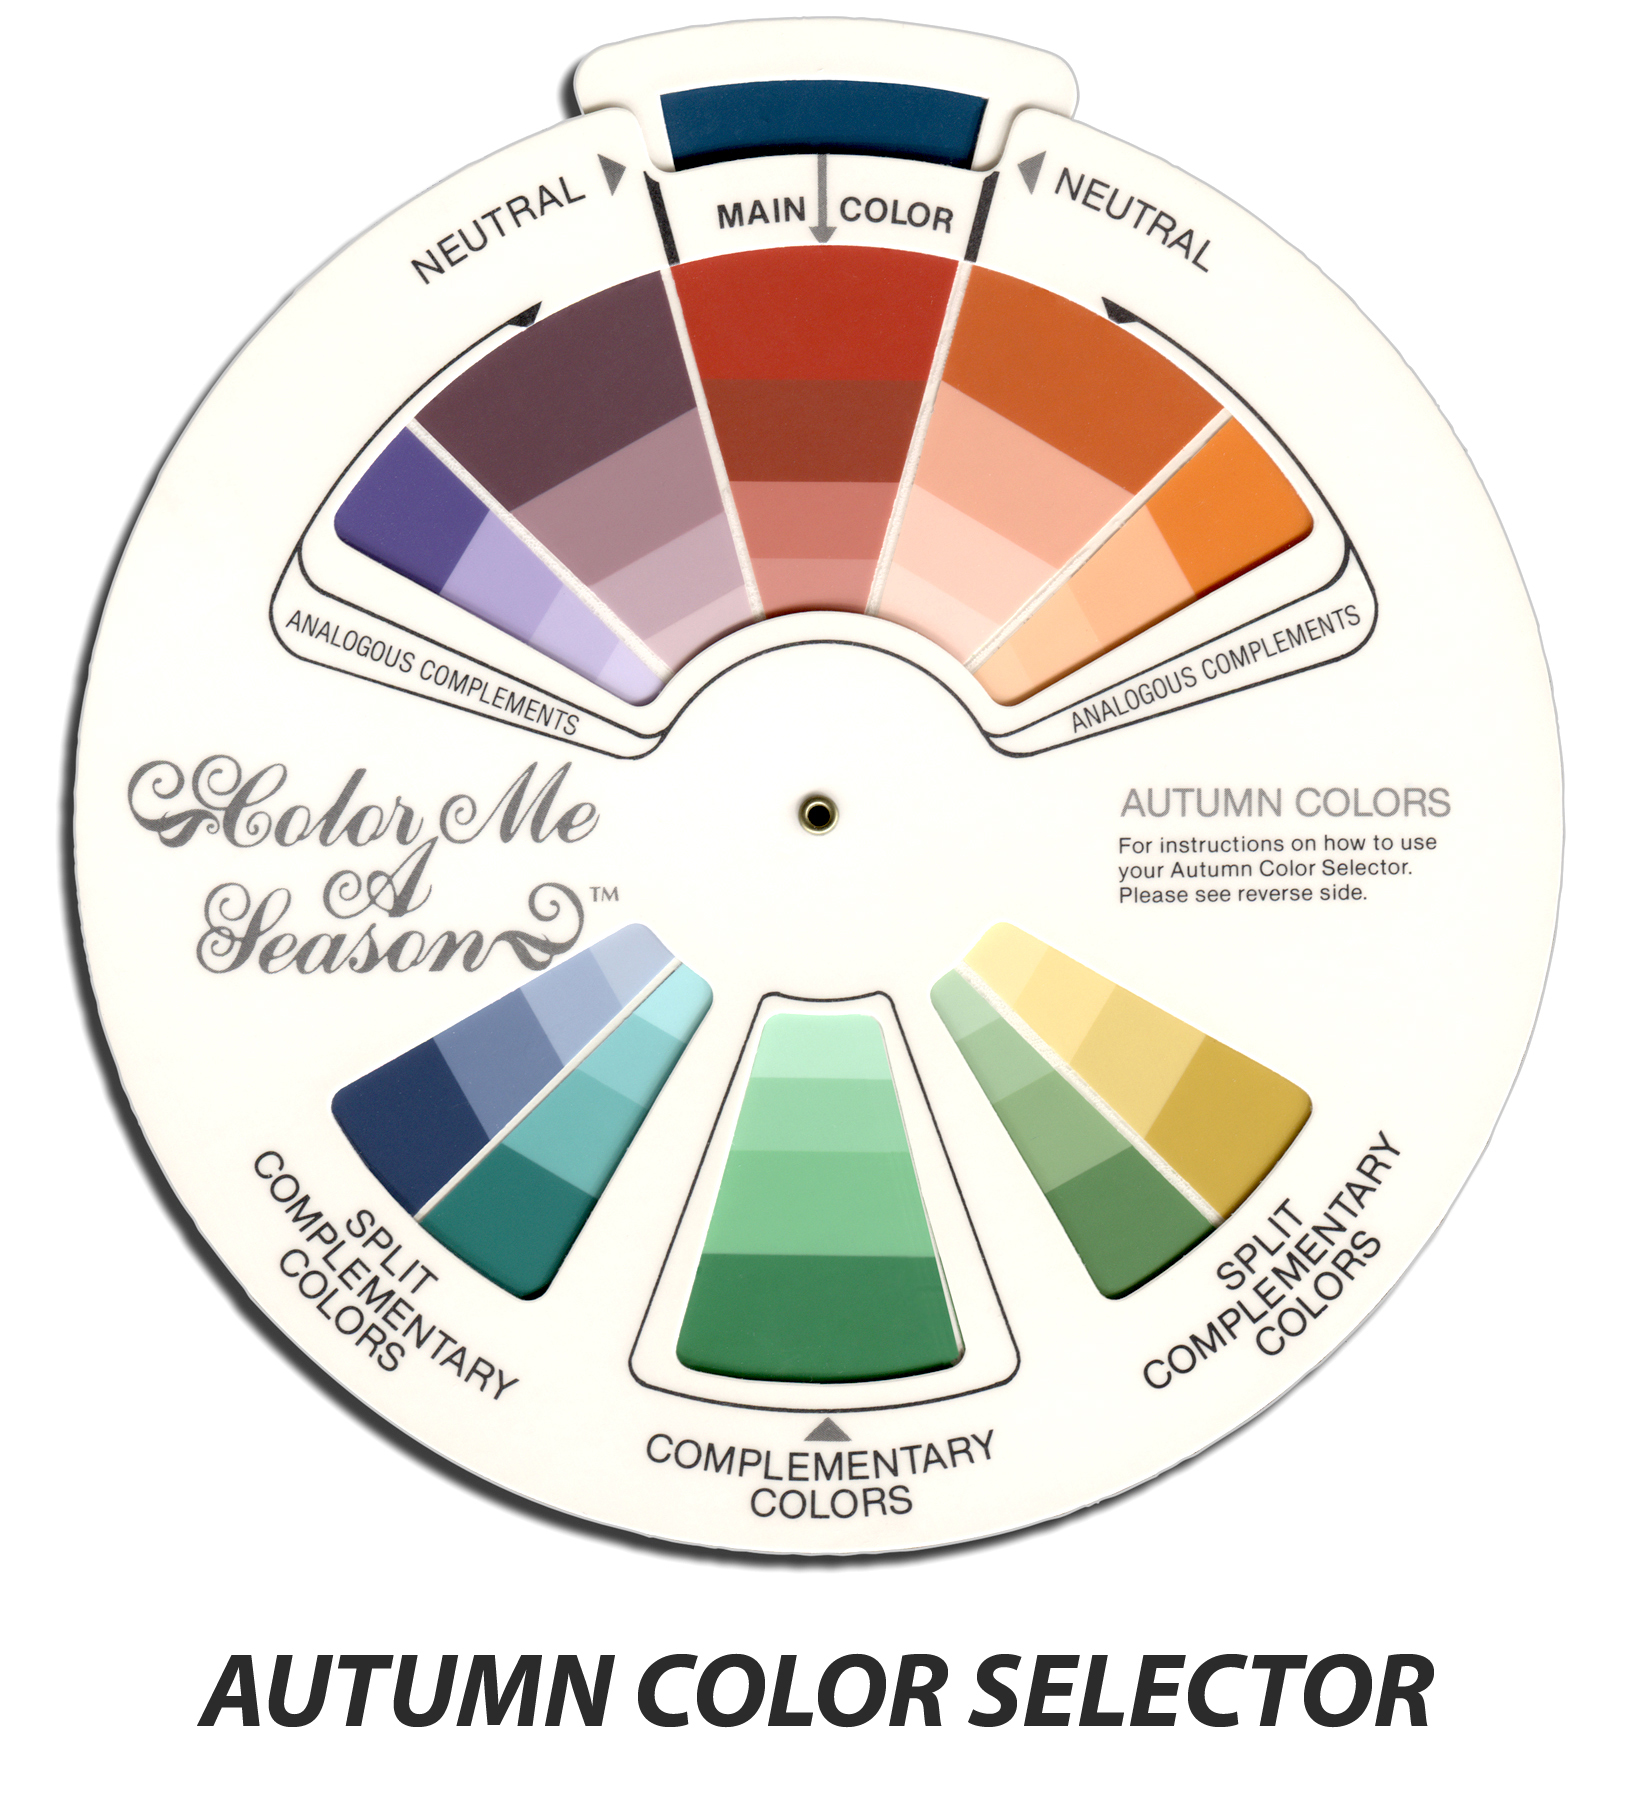 autumnselector-text-200ppi.jpg